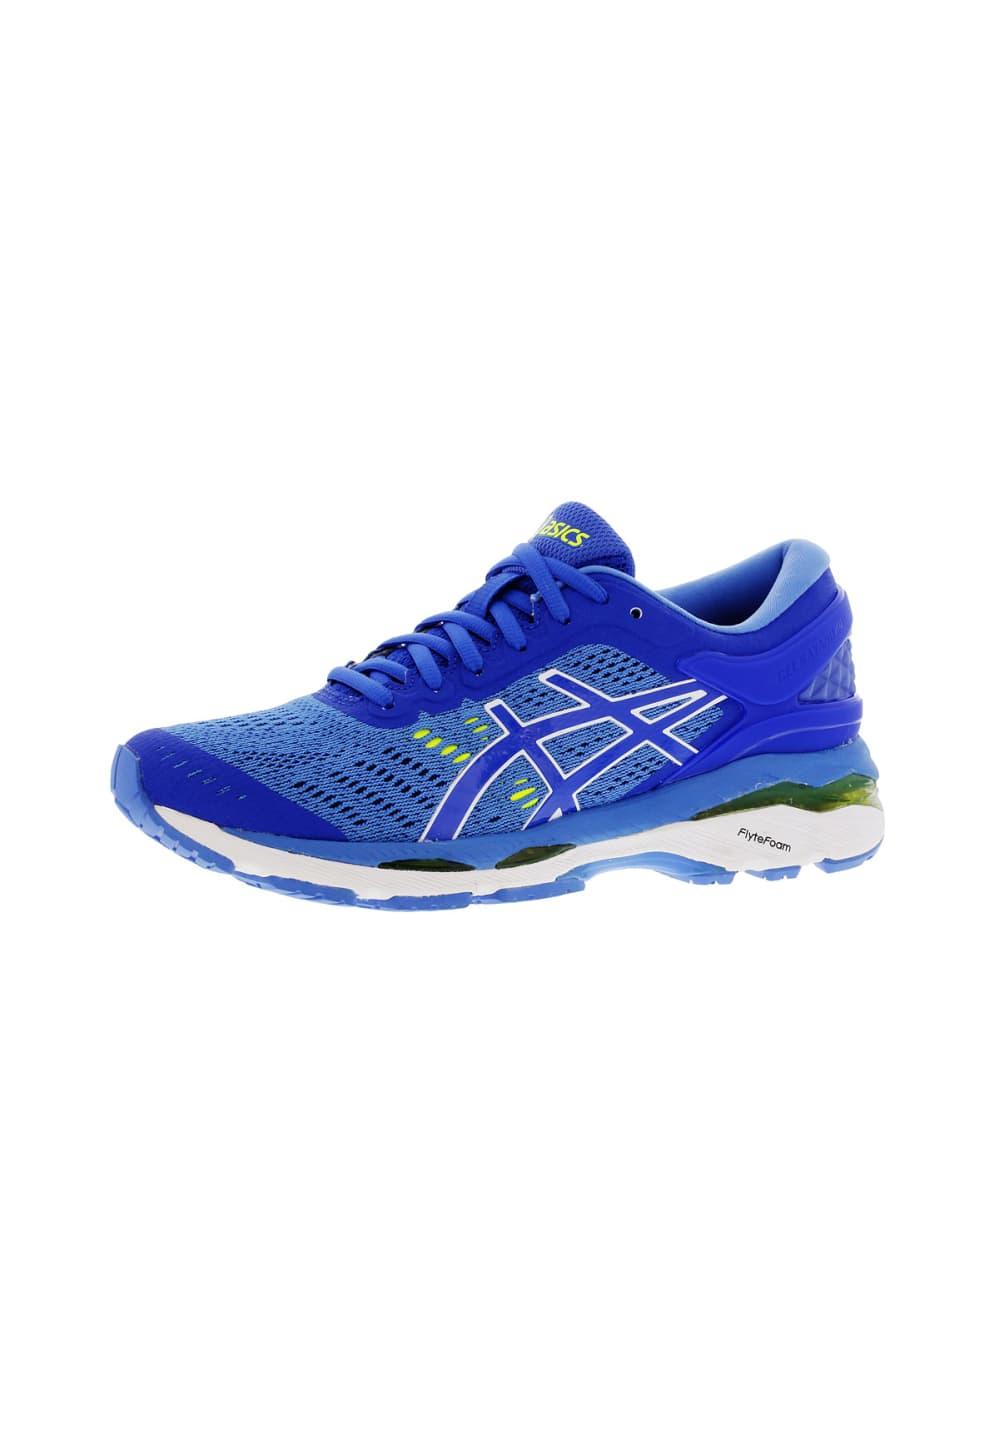 ASICS GEL-Kayano 24 - Laufschuhe für Damen - Blau